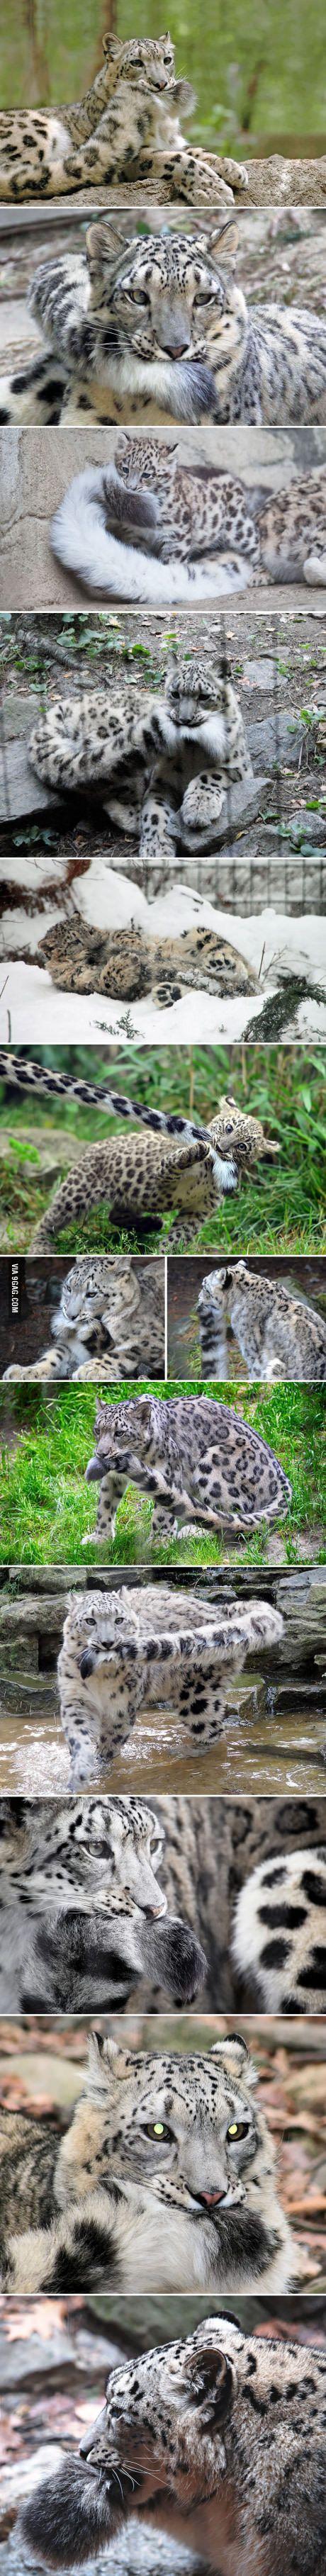 I <3 snow leopards.